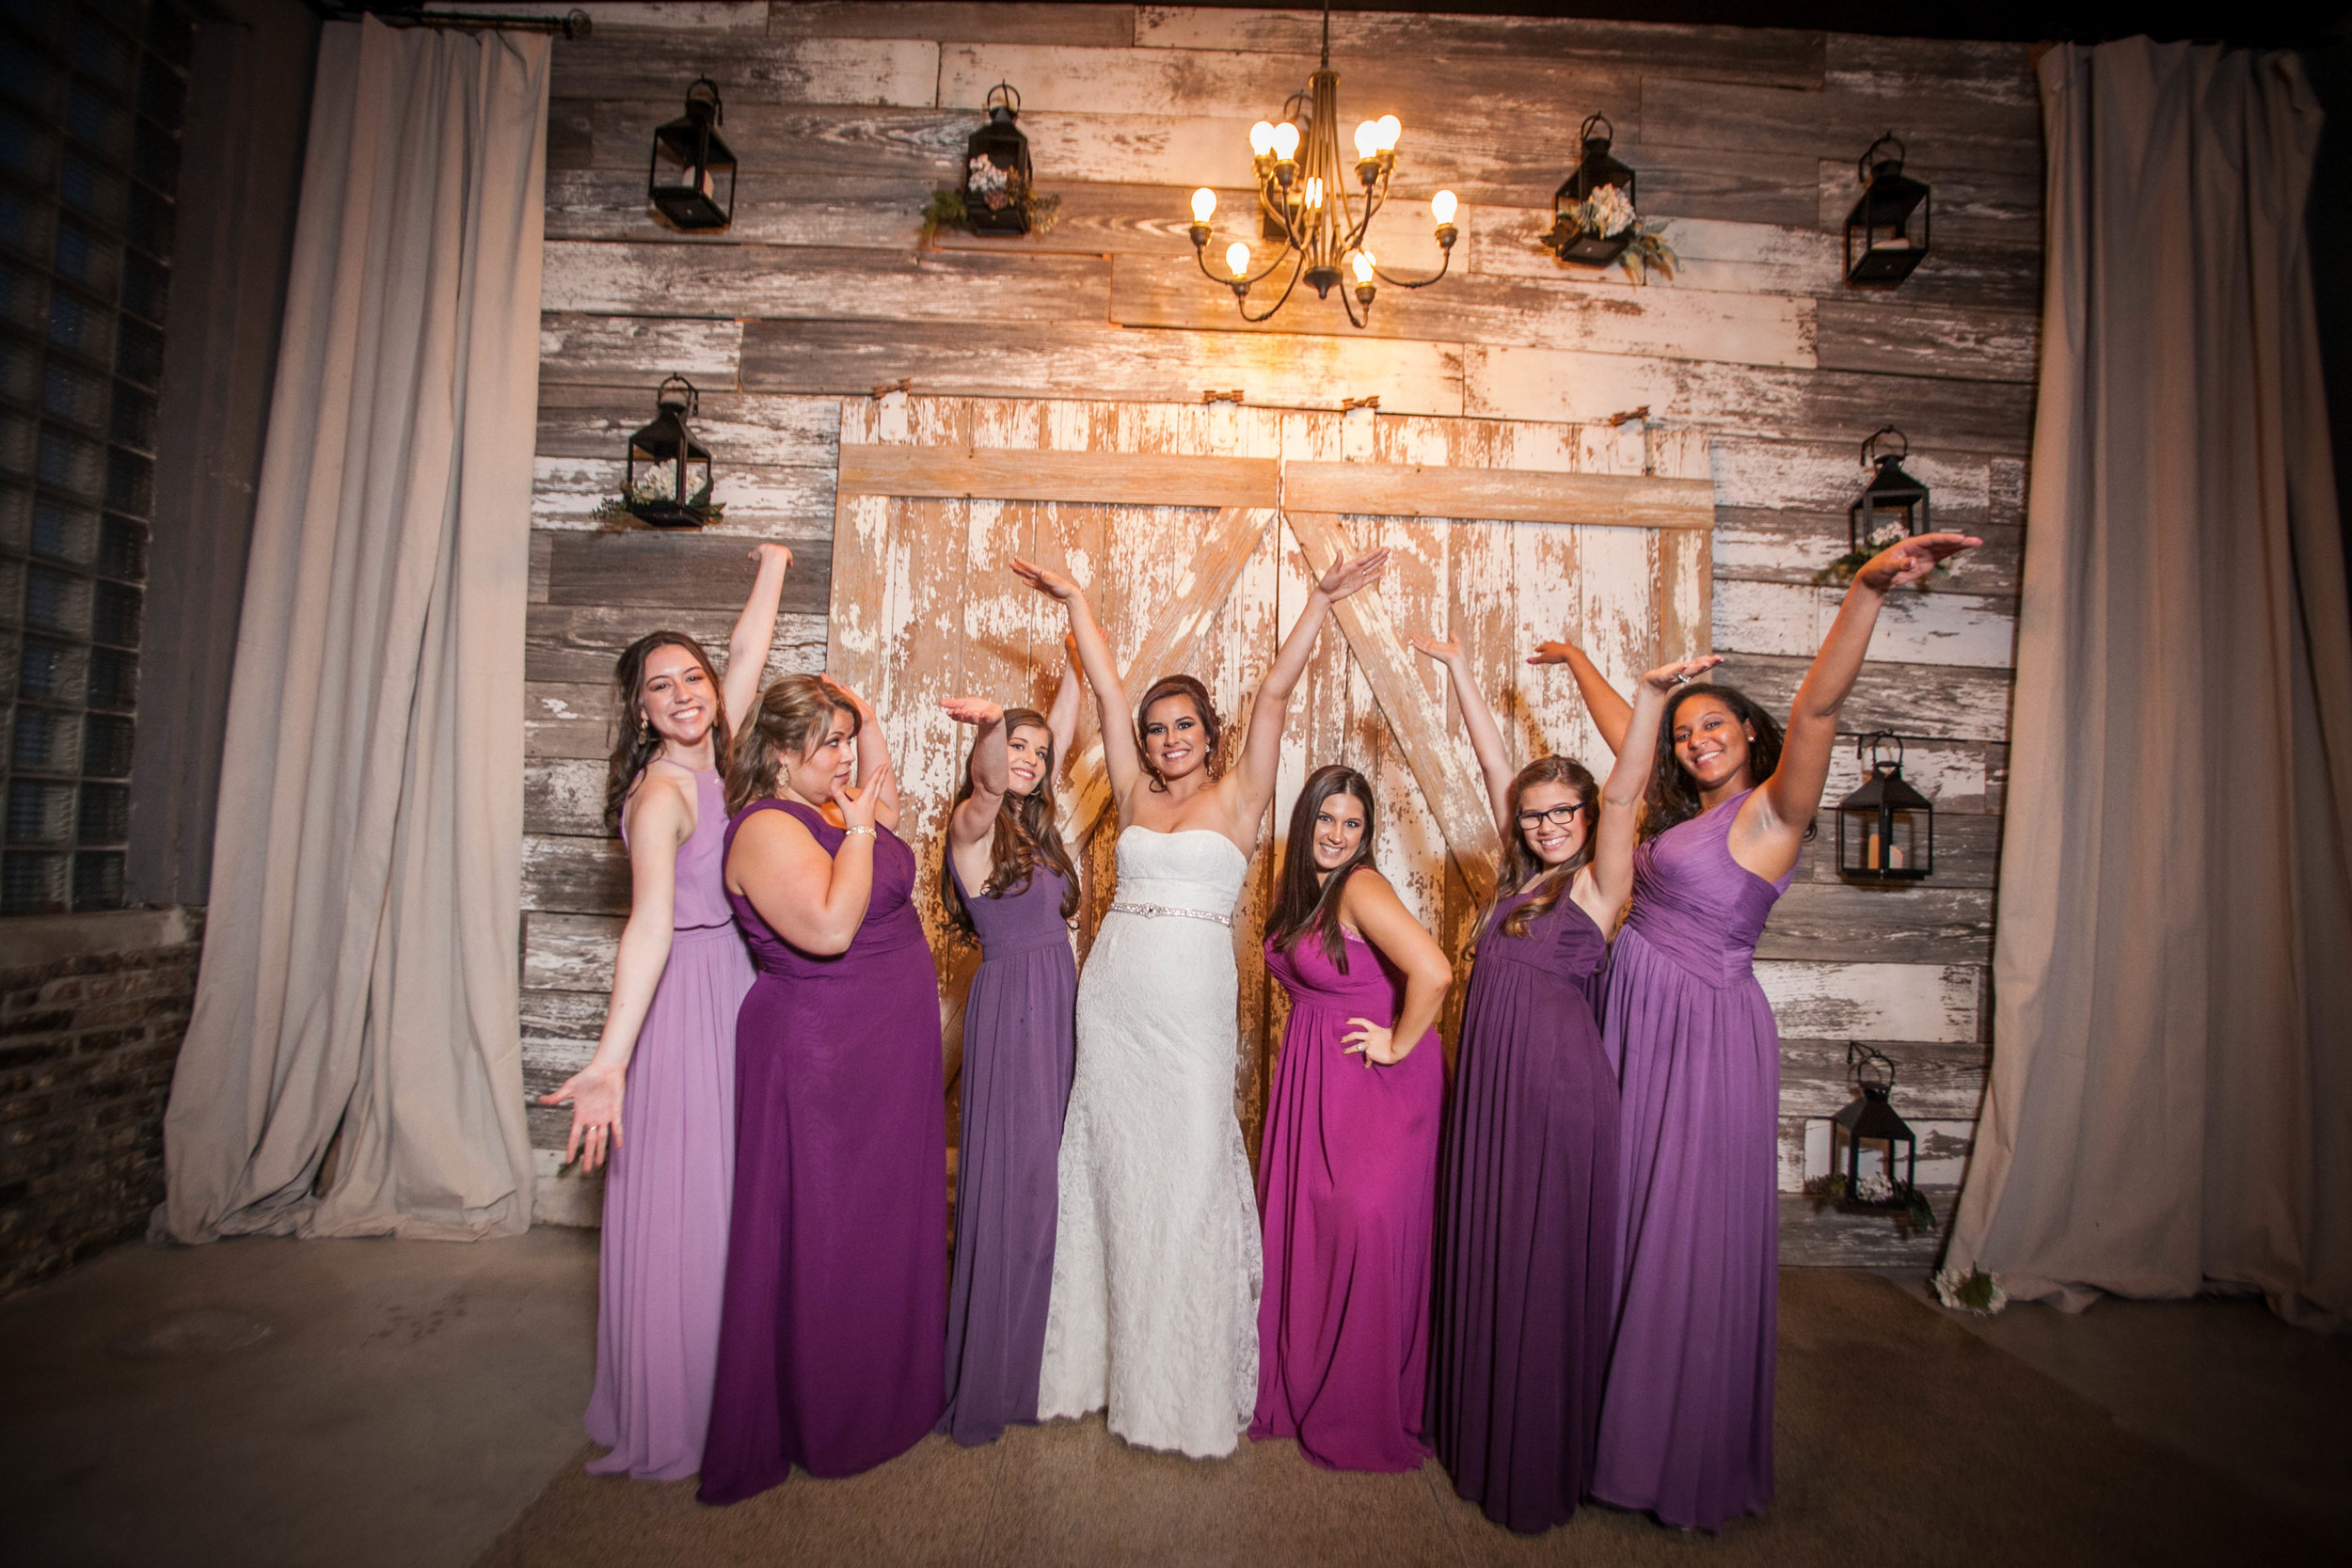 Kansas+City_Small+Wedding_Elope_Intimate_Ceremony_Best+Friends_Madeline&Dalaino-281.jpg